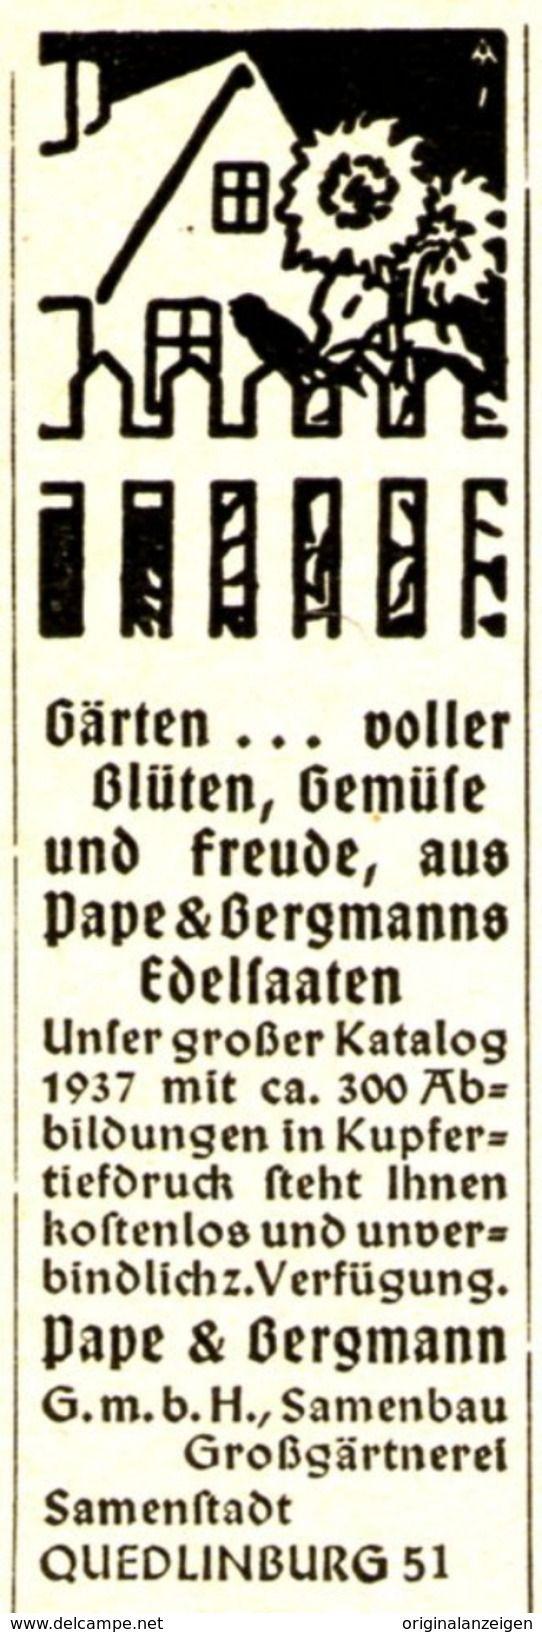 Elegant Werbung Original Werbung Anzeige EDELSAATEN PAPE u BERGMANN QUEDLINBURG